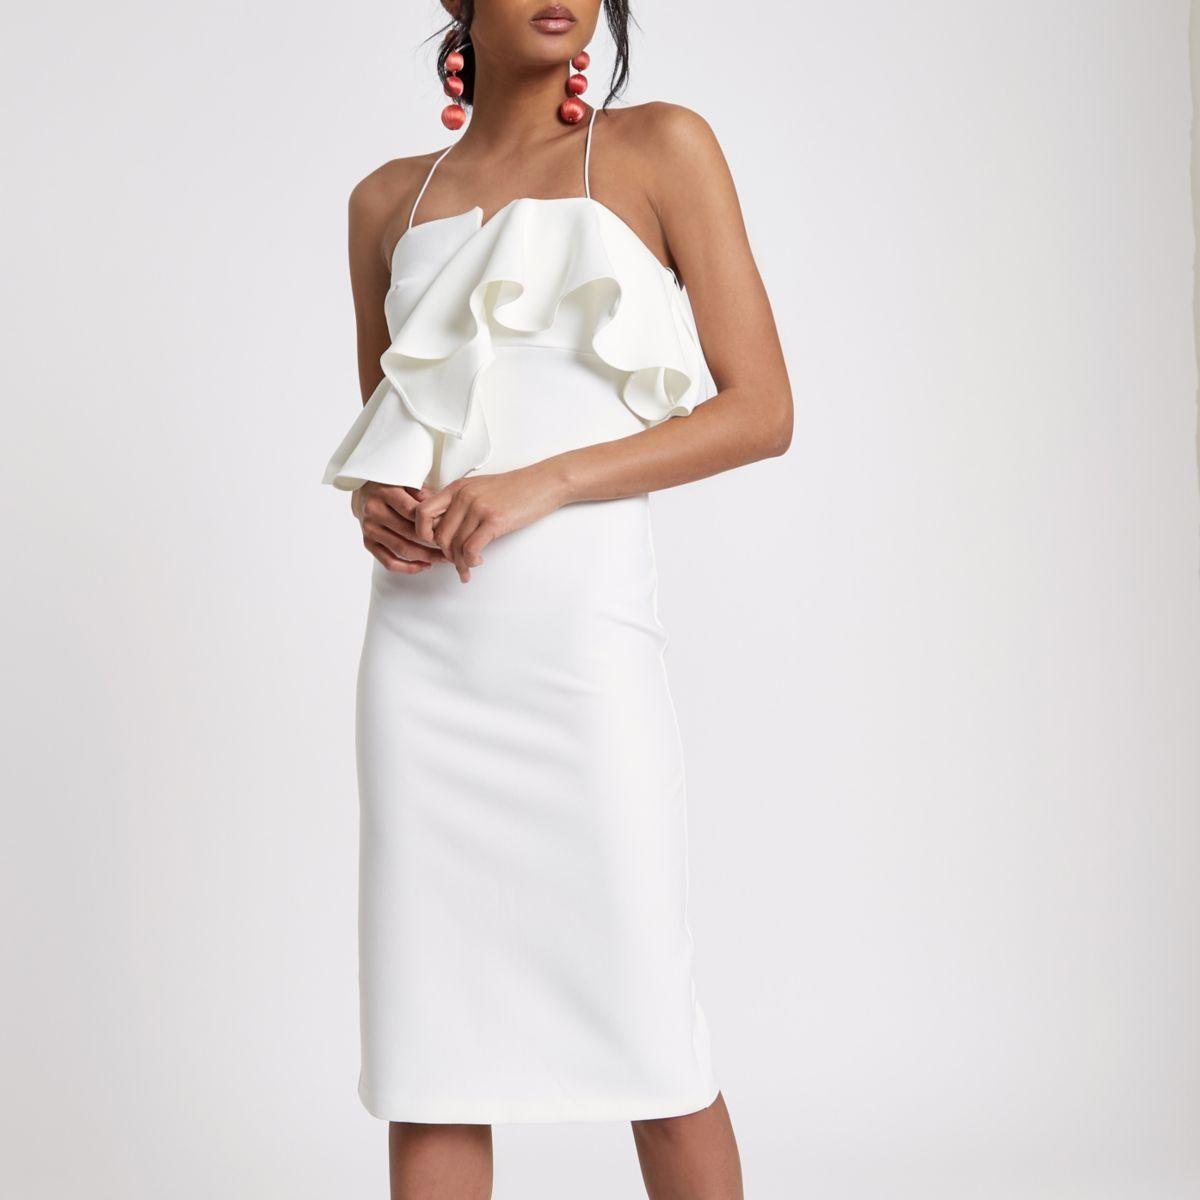 White peplum waist bodycon dress